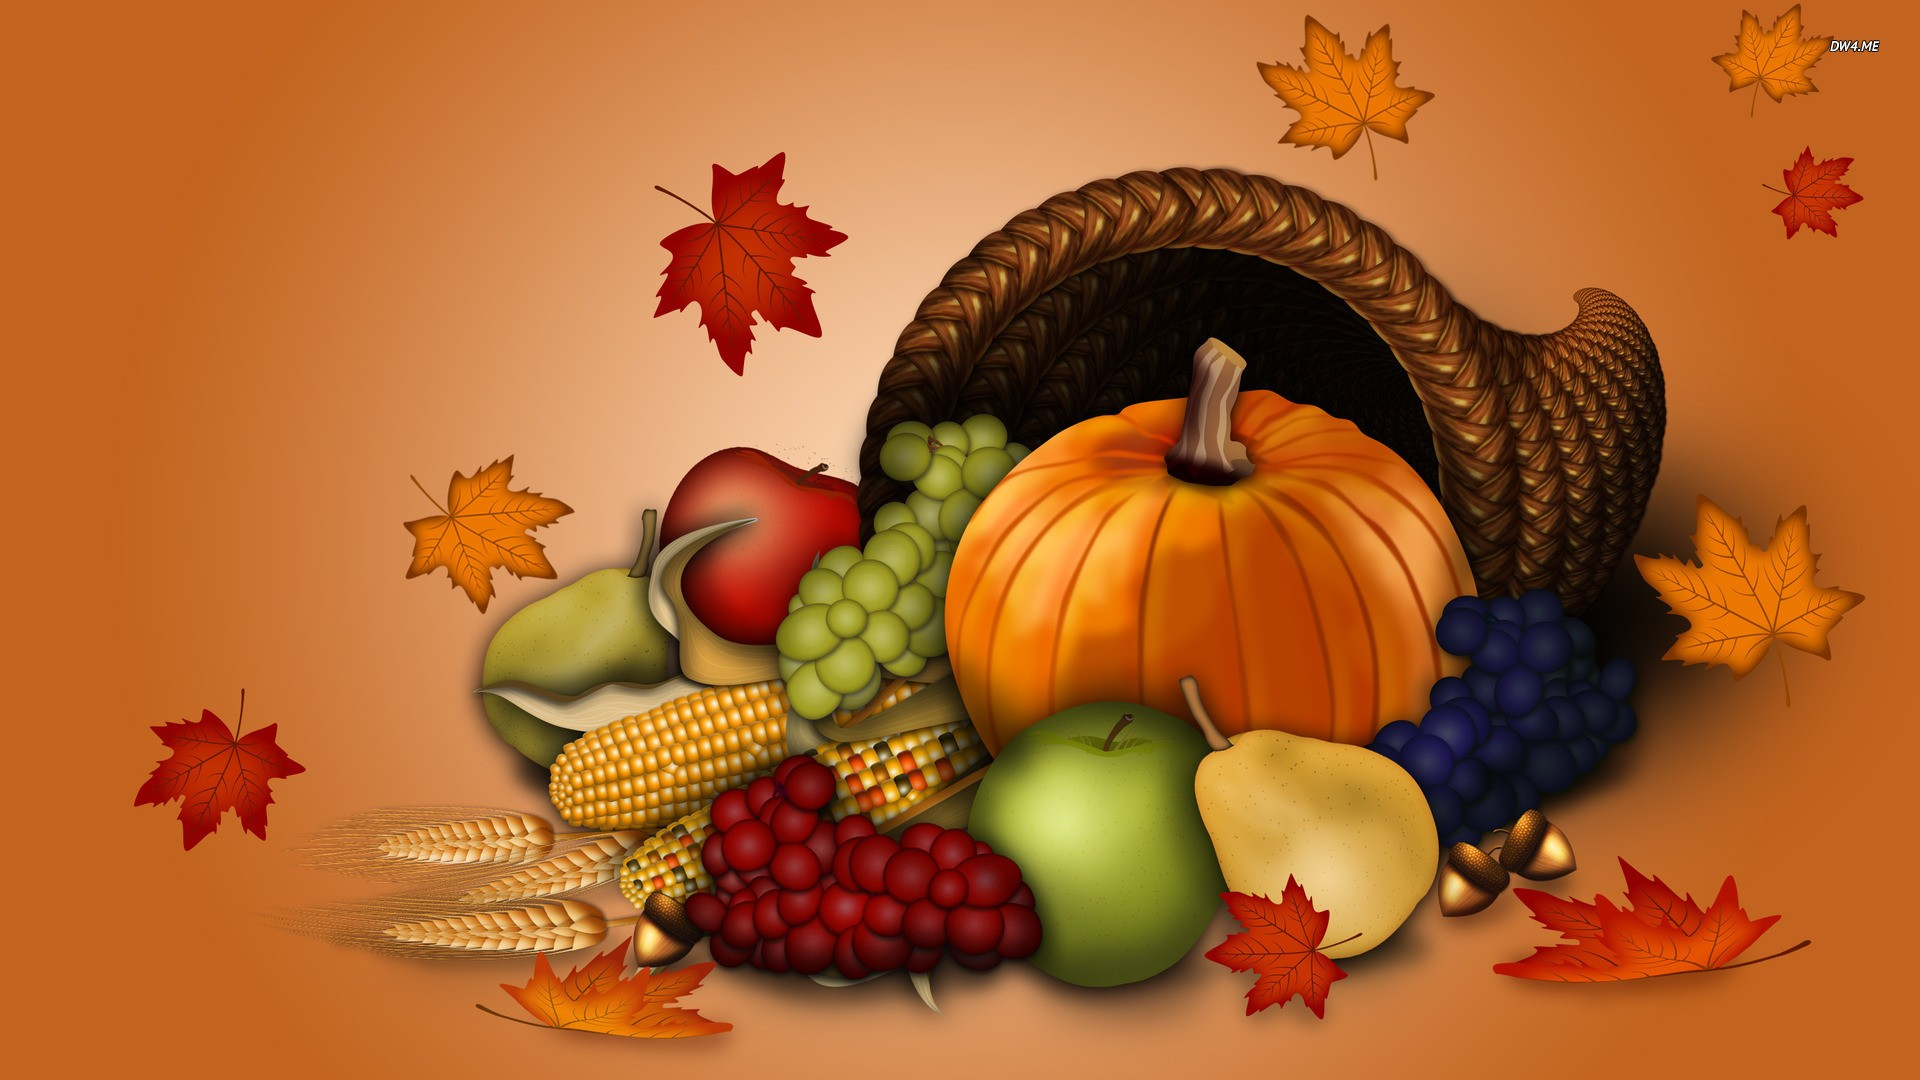 High Resolution Thanksgiving Backgrounds - HD Wallpaper